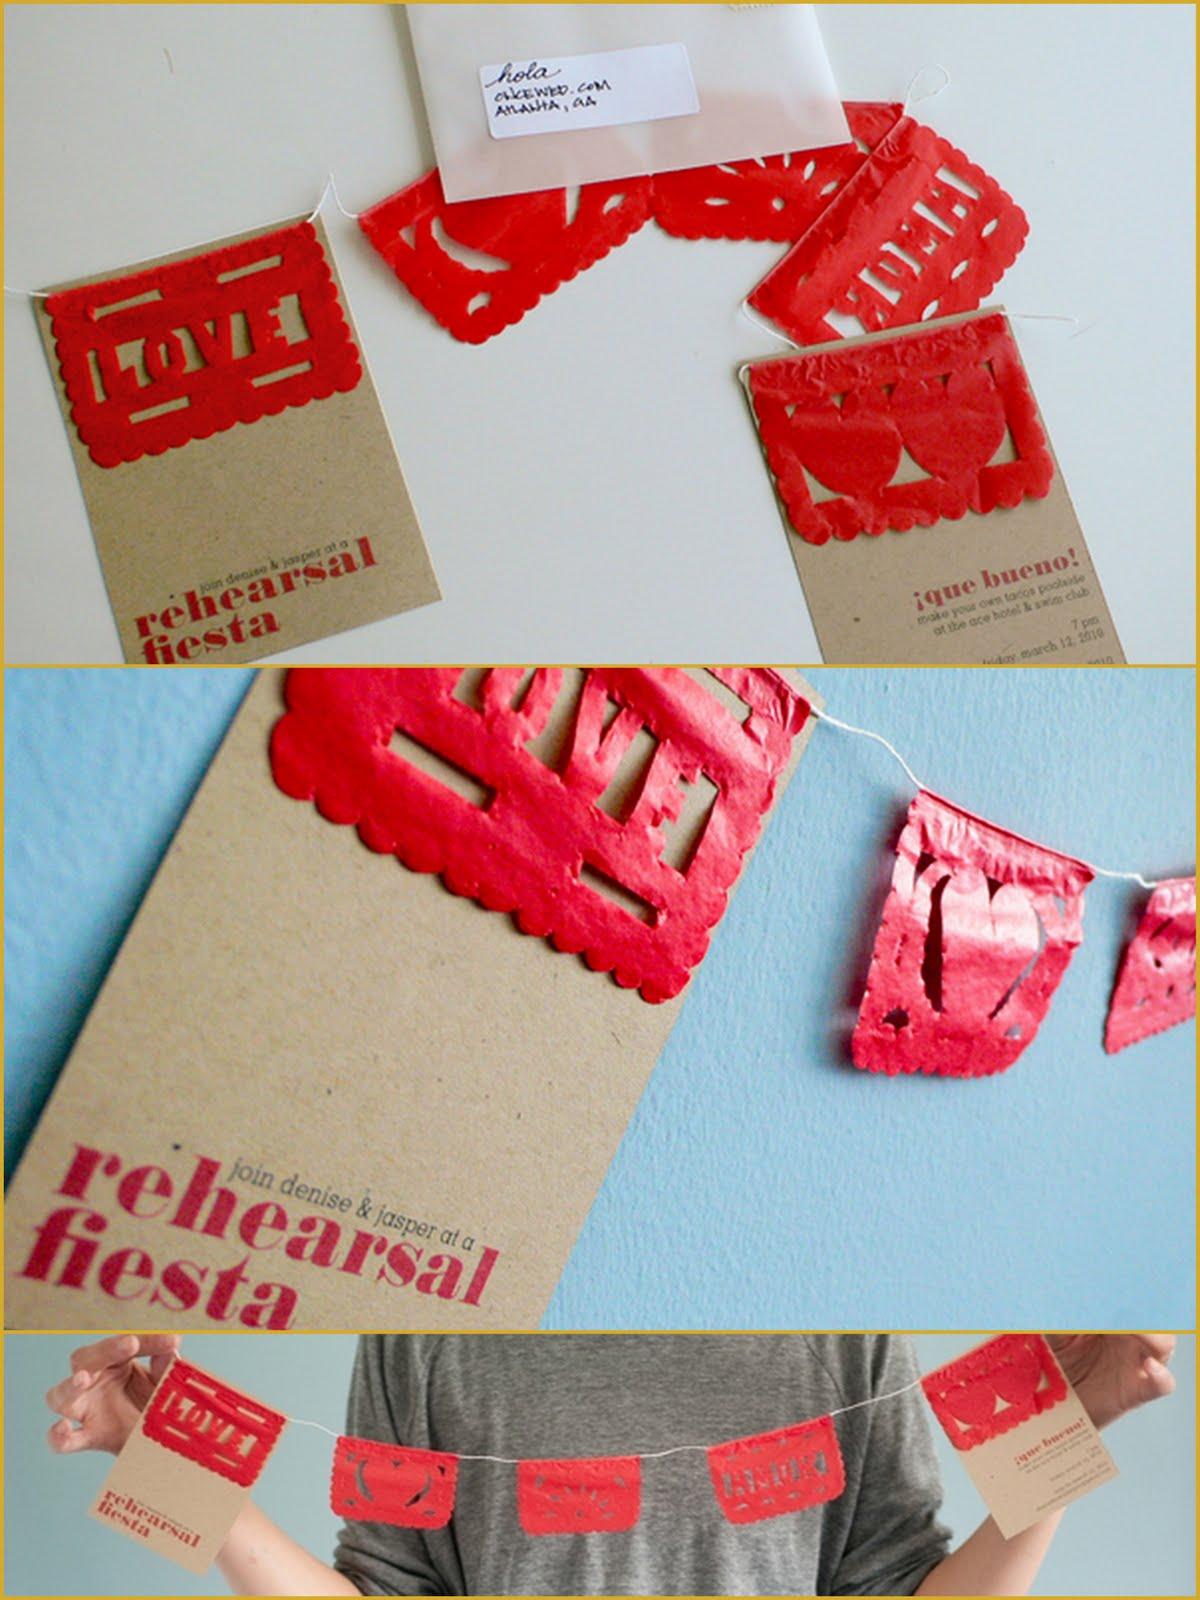 Despedida Invitation is adorable invitations layout